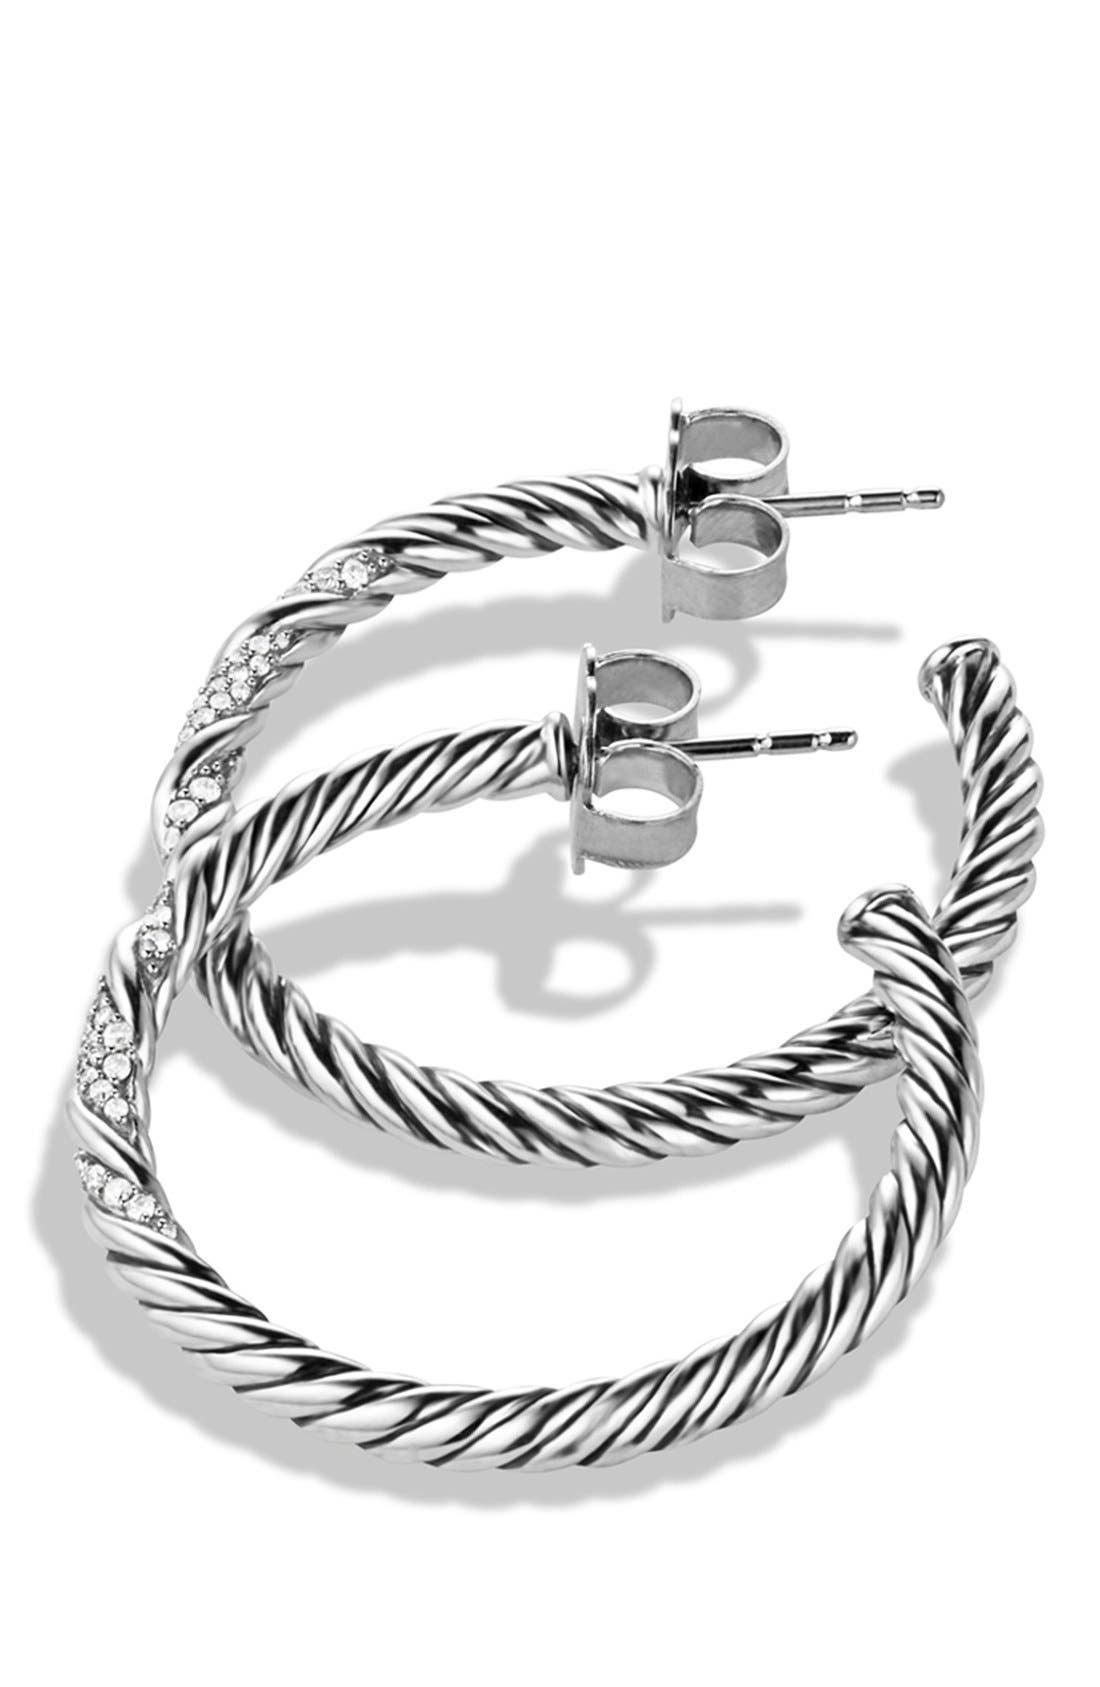 Alternate Image 2  - David Yurman 'Willow' Medium Hoop Earrings with Diamonds